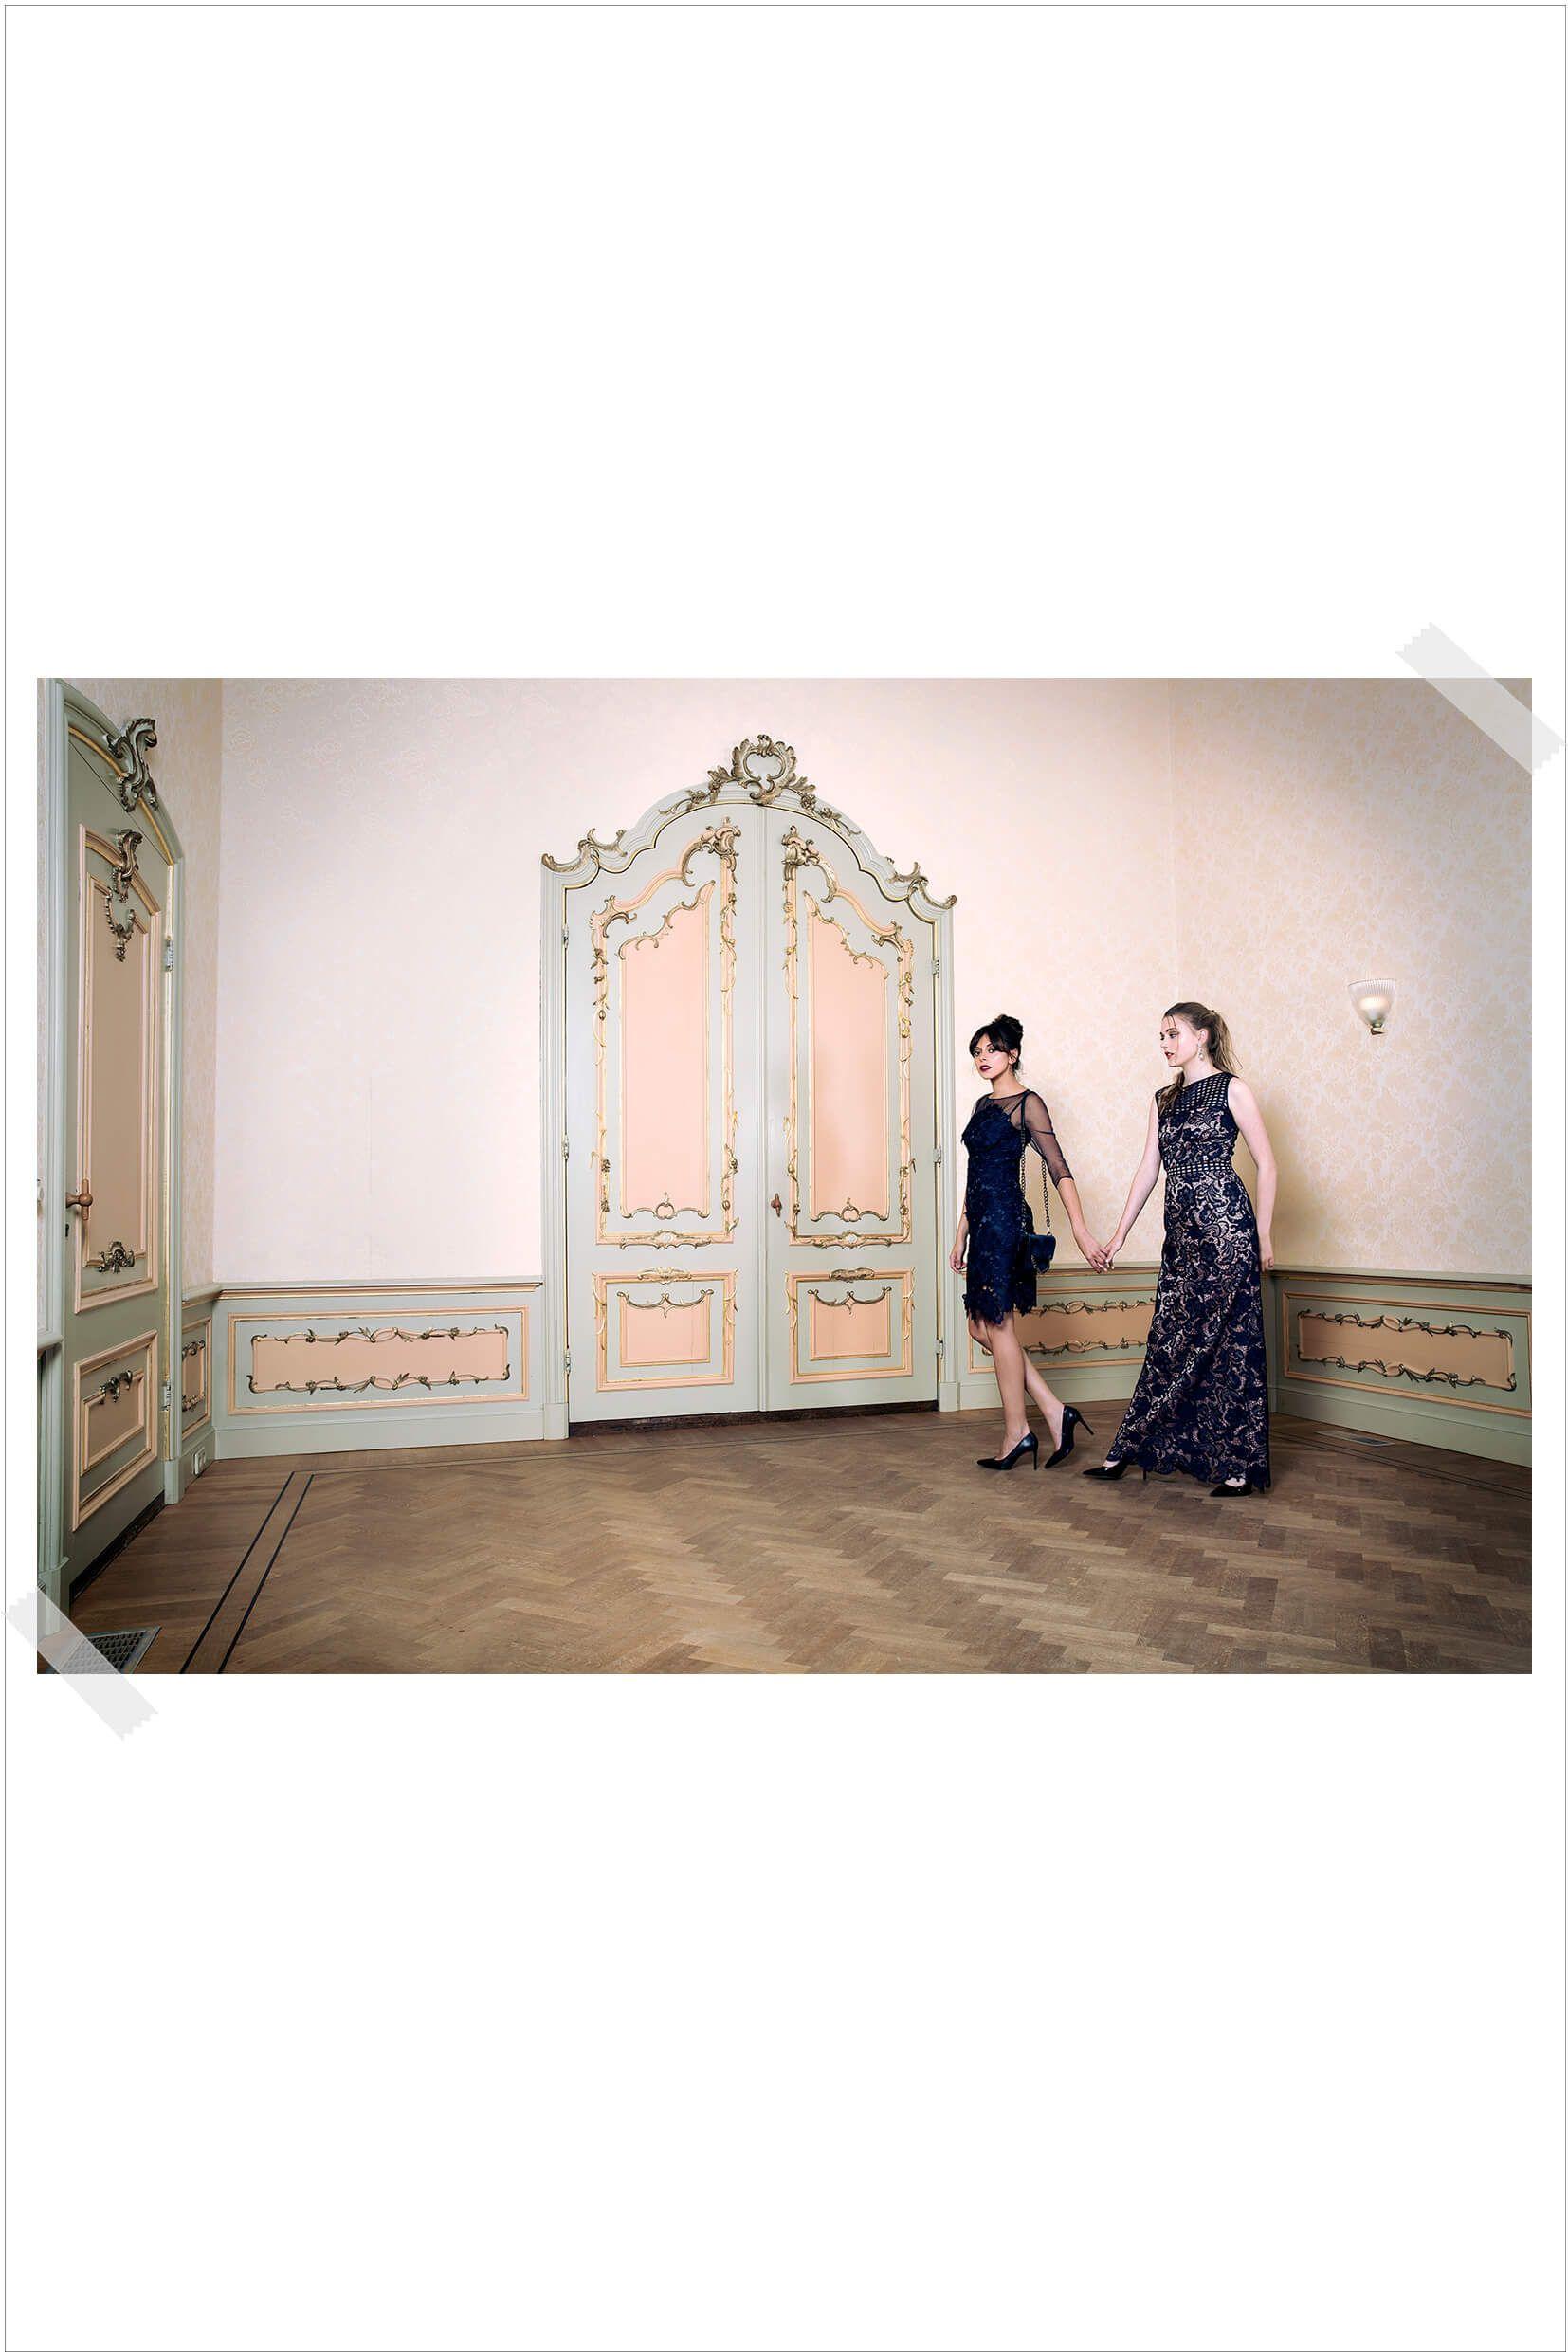 Jurken Huren. Adrianna Papell. Brittlebush. Elegant dresses. Maxi dress. Midi dress. Photographer Elza van der Saag.